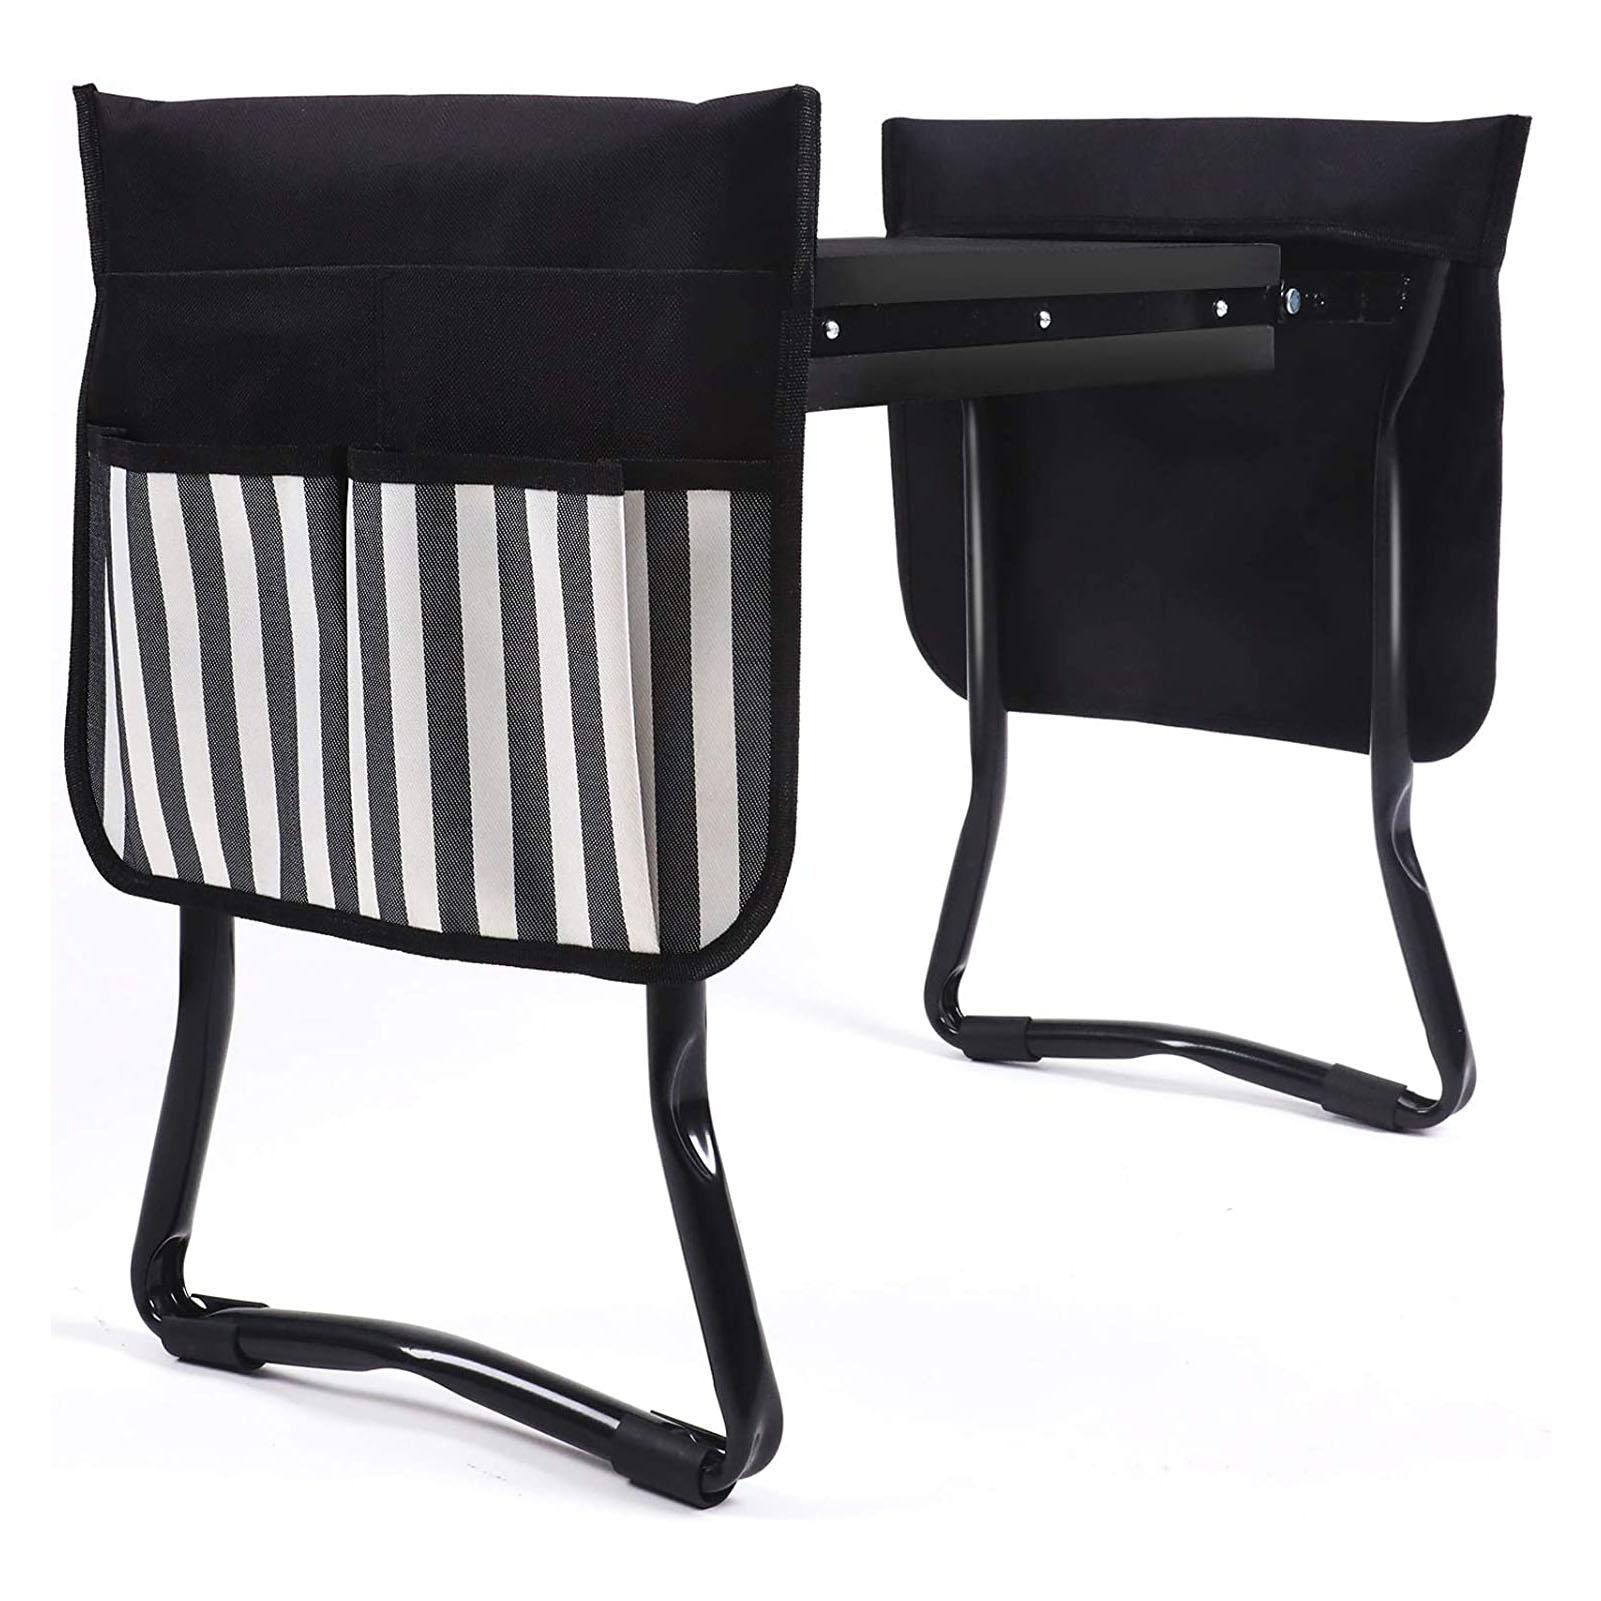 Folding Garden Kneeler Seat Tool Bag Portable Tool Storage Bag Pouch For Knee Stool Gardening Tools Storage Pouch Tool Kit